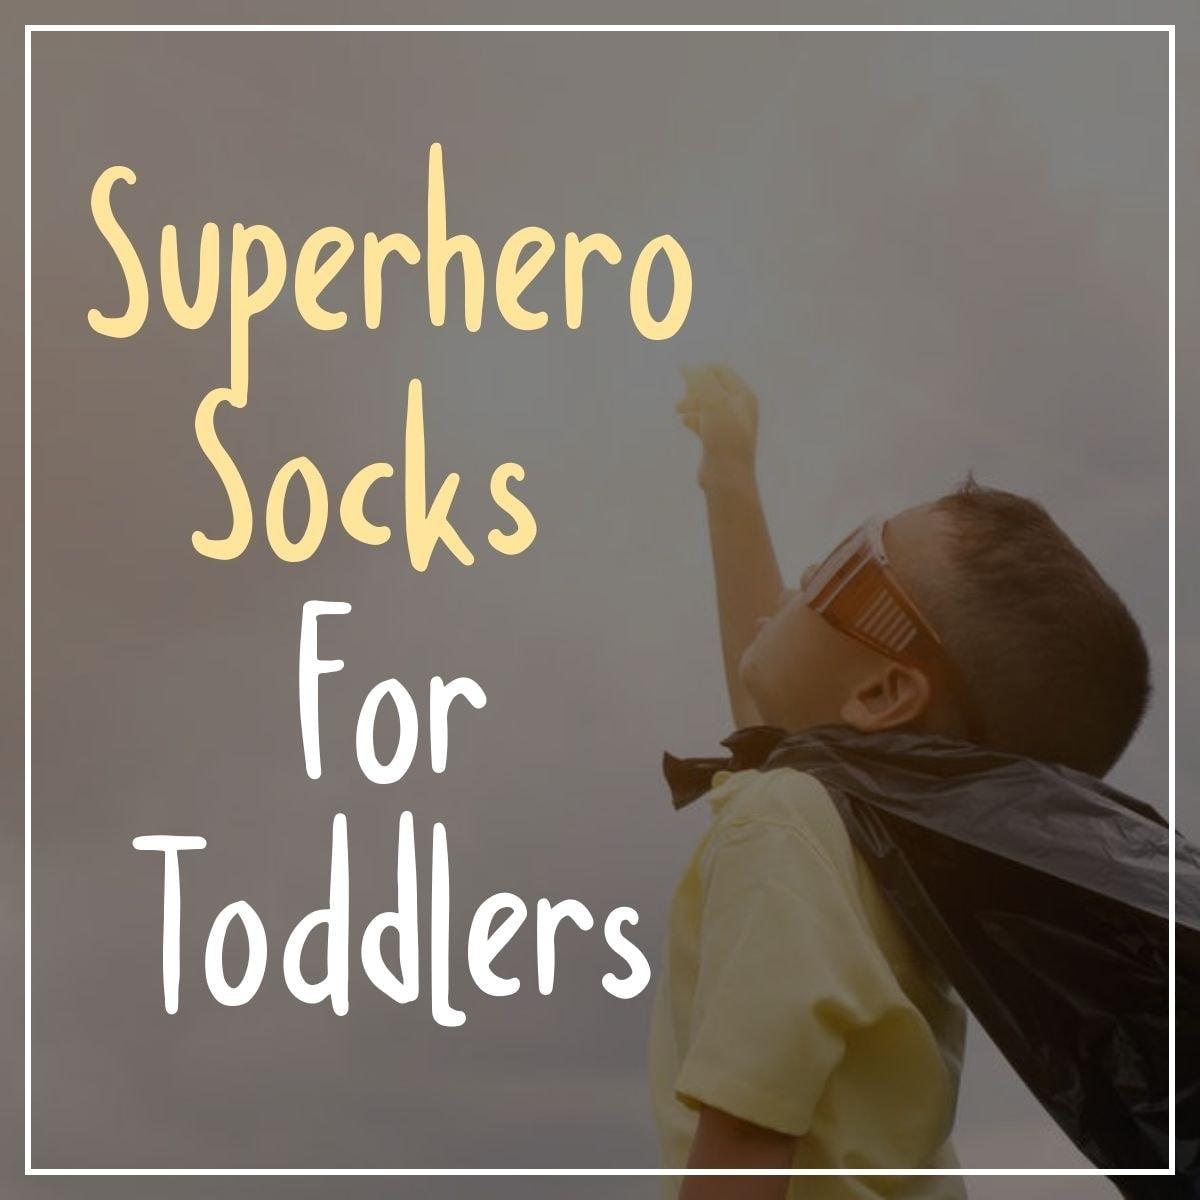 Superhero Socks For Toddlers